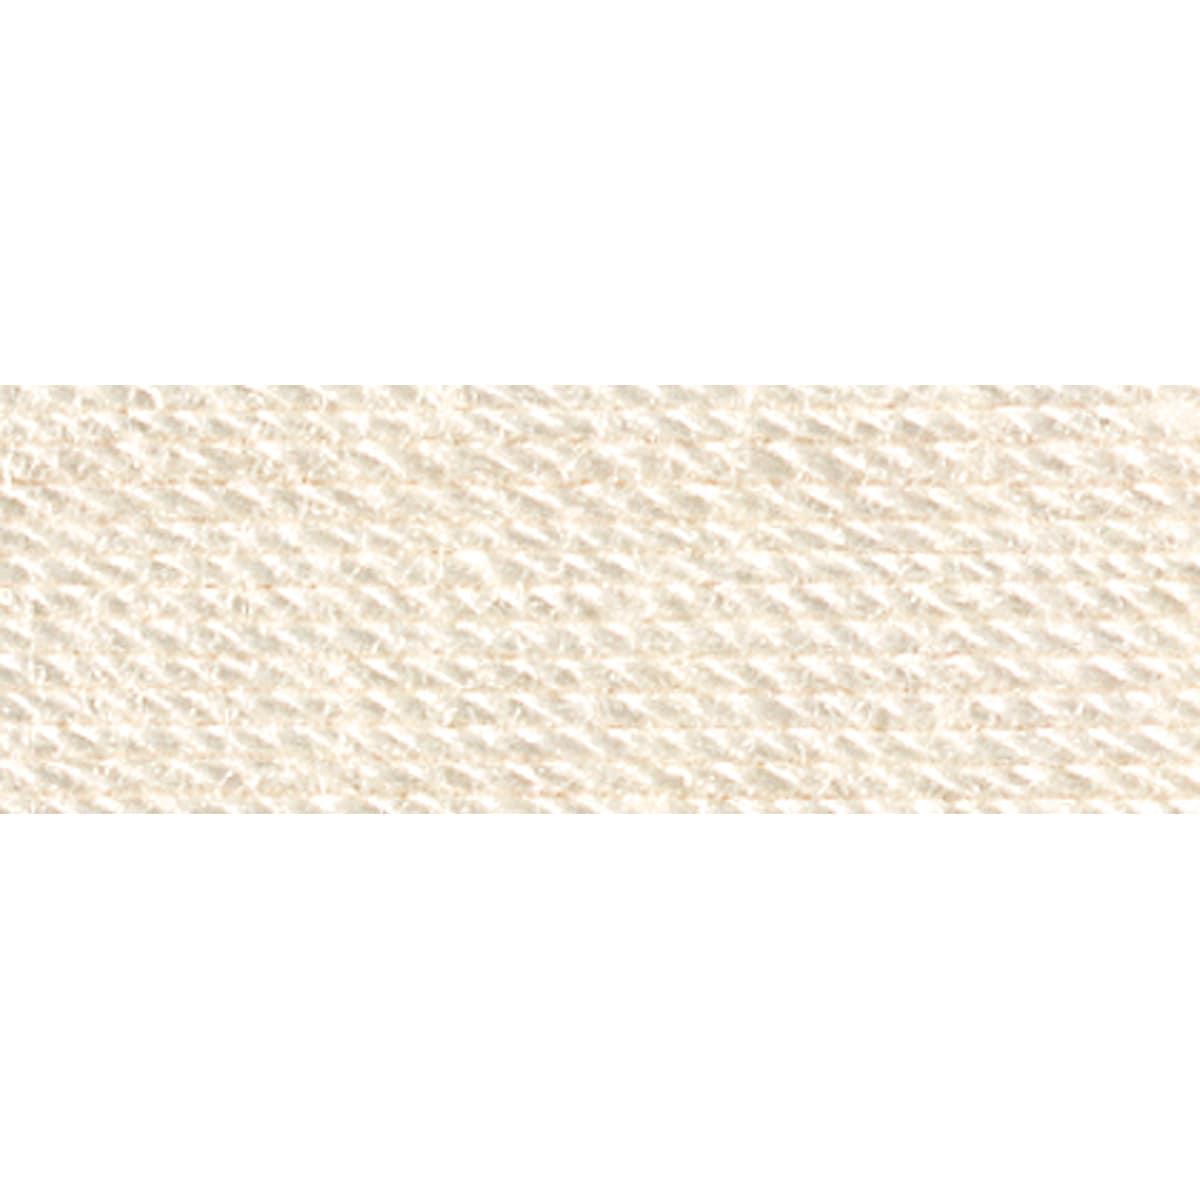 Cebelia Crochet Cotton Size 30 - 563 Yards-Cream